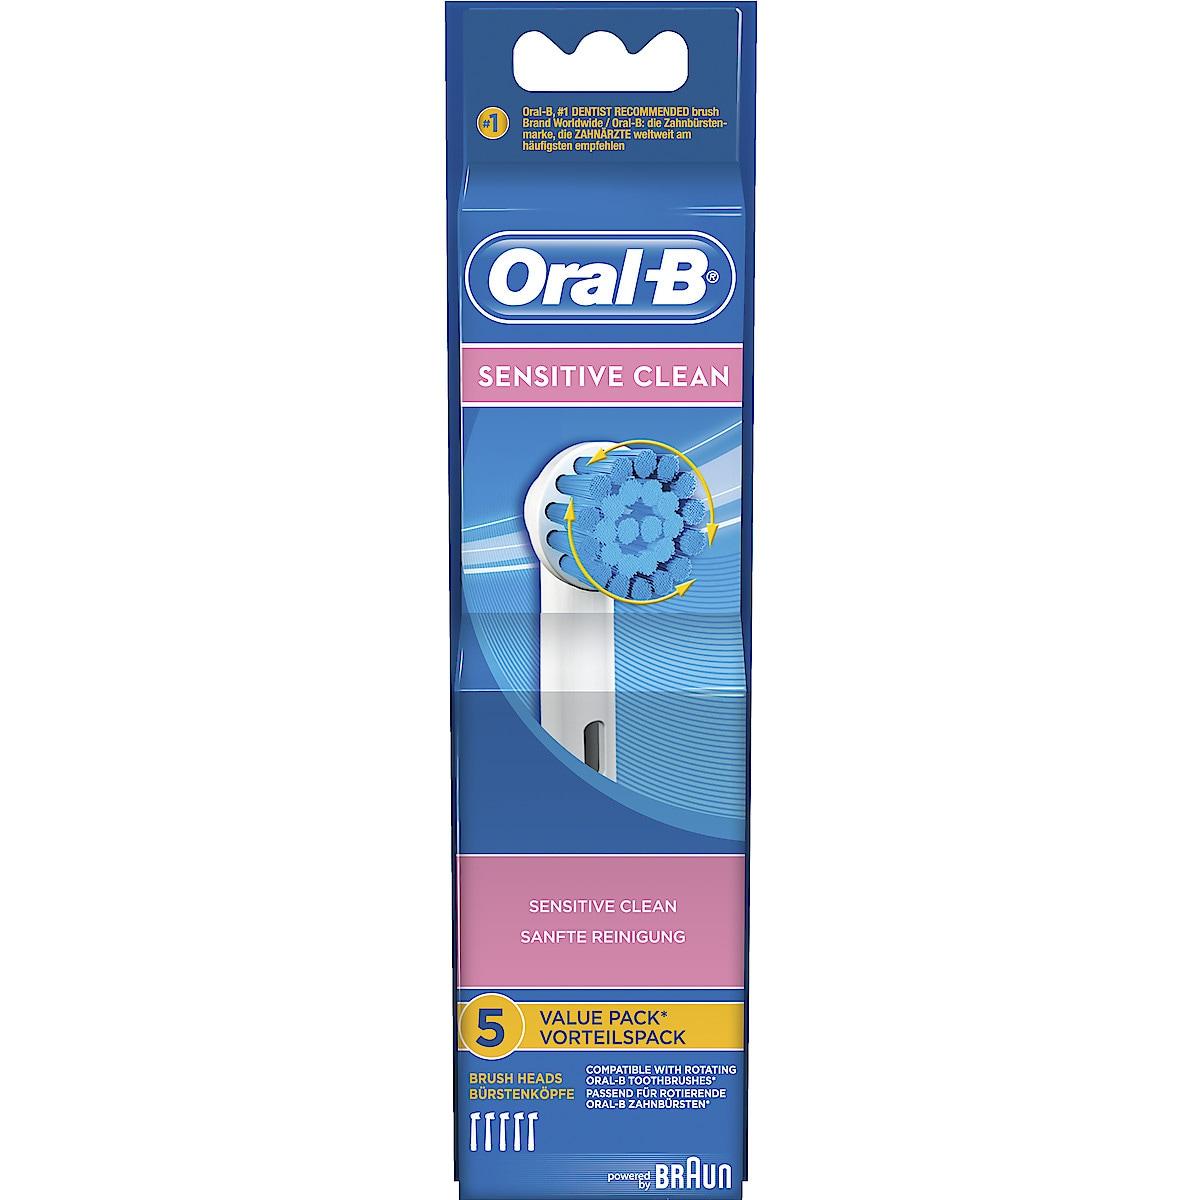 Oral-B Sensitive Clean Toothbrush Head Refills